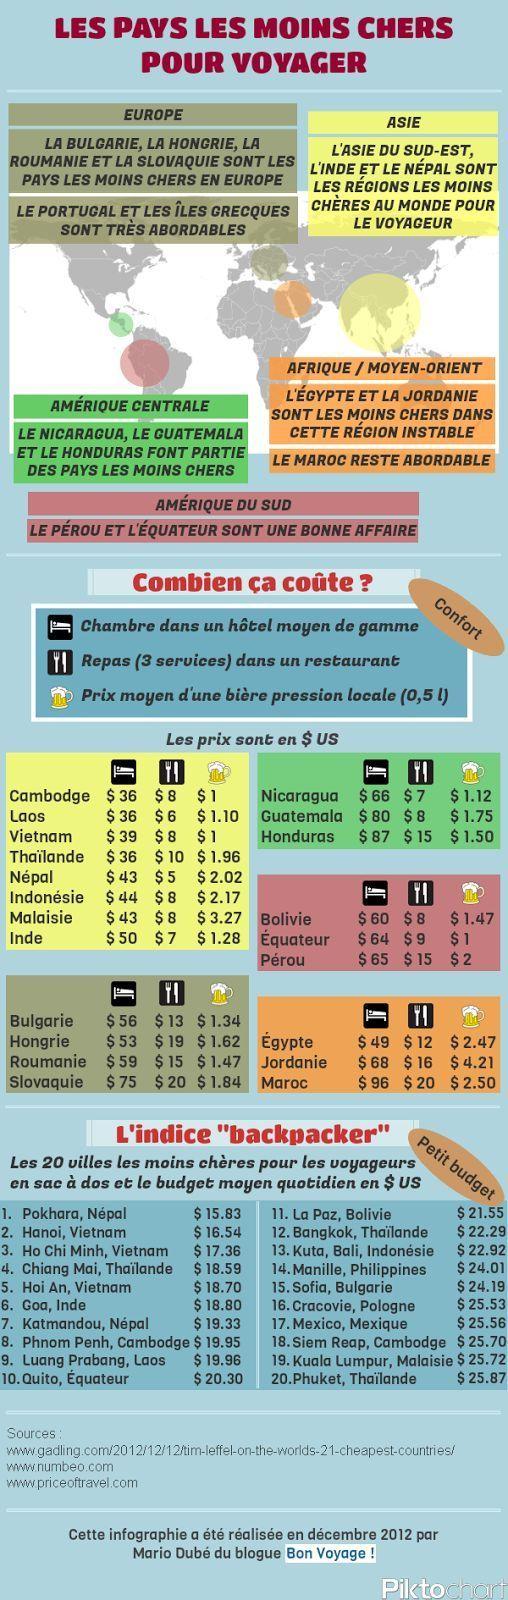 Infographie : Les pays les moins chers pour voyager  #pays #budget #cheap #pascher #voyage #information #guide #infographie